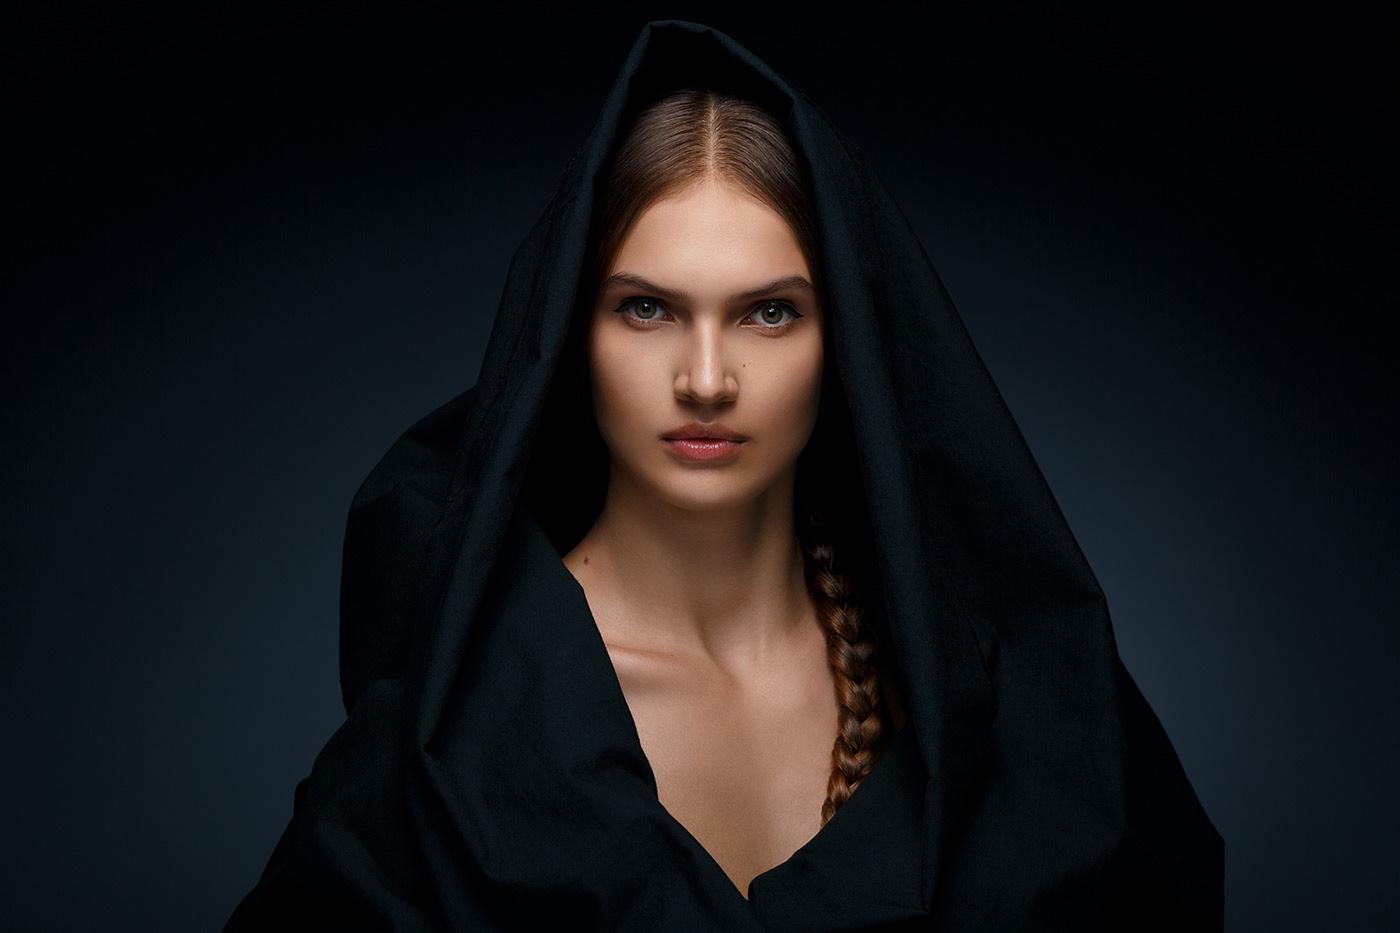 portrait photography valar moughlis by ruslan rakhmatov